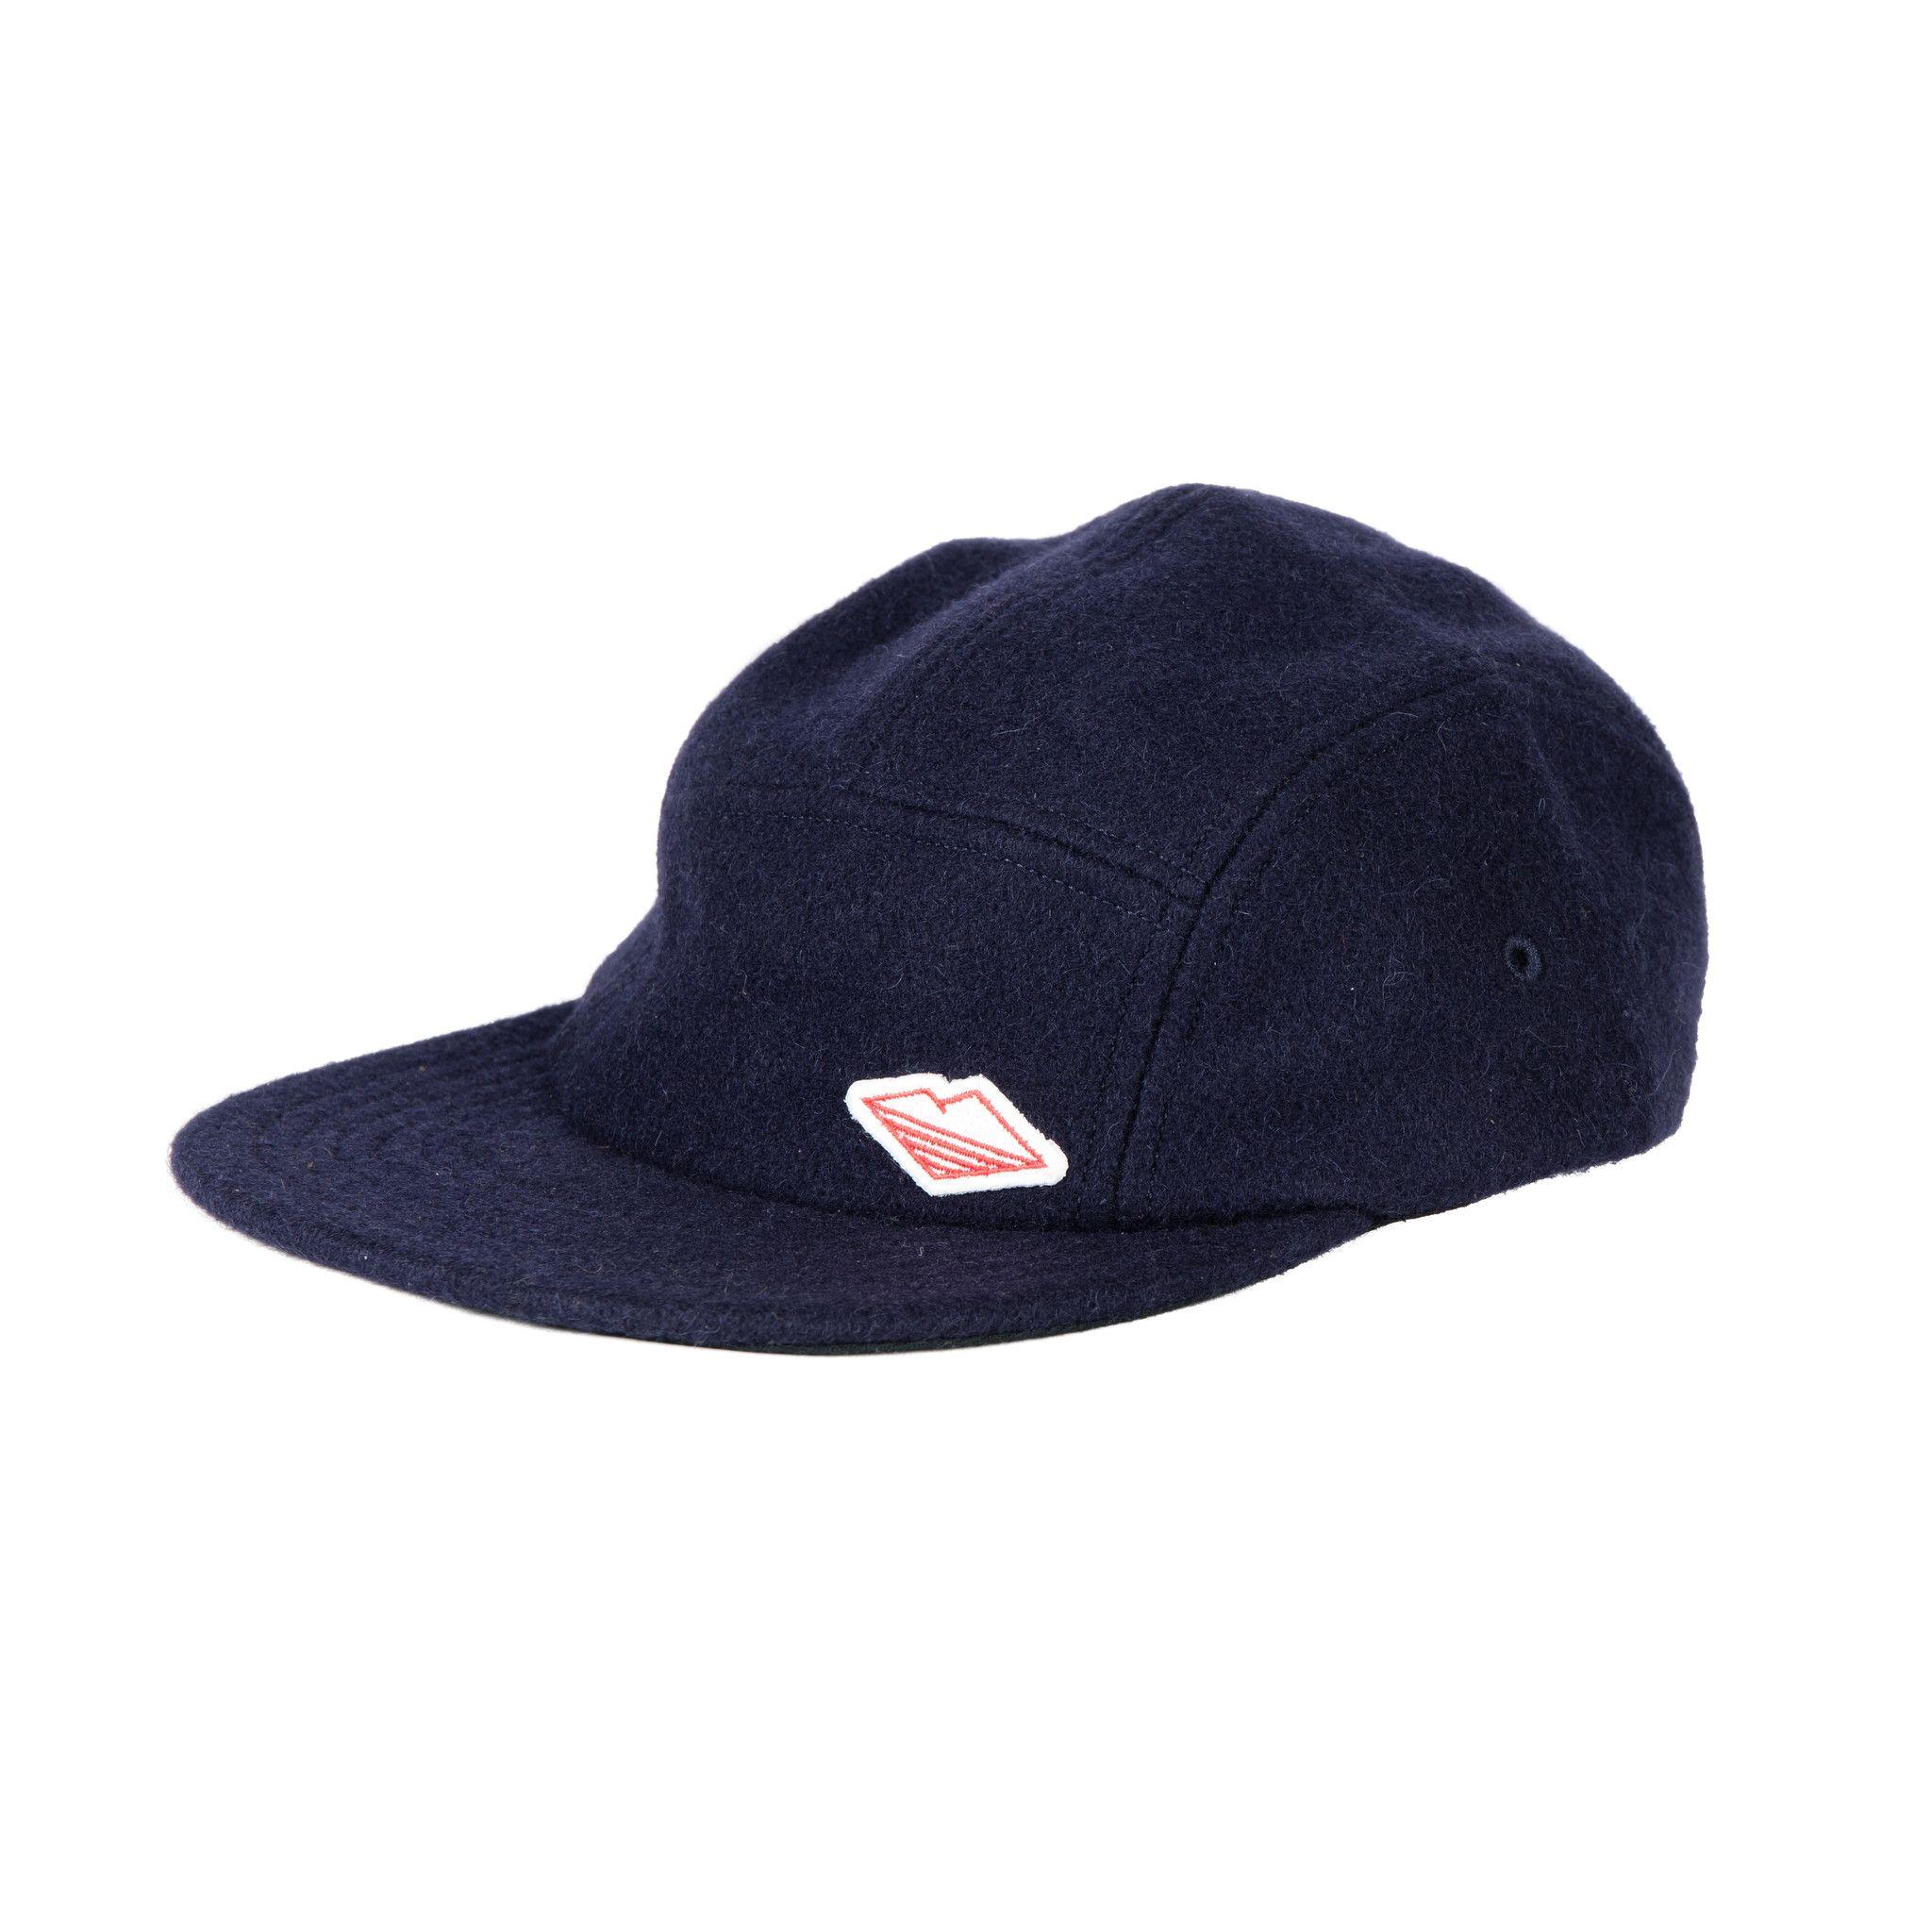 Battenwear -Battenwear Travel Cap—Navy - BlackBlue - Default ... 6bb439391d3f